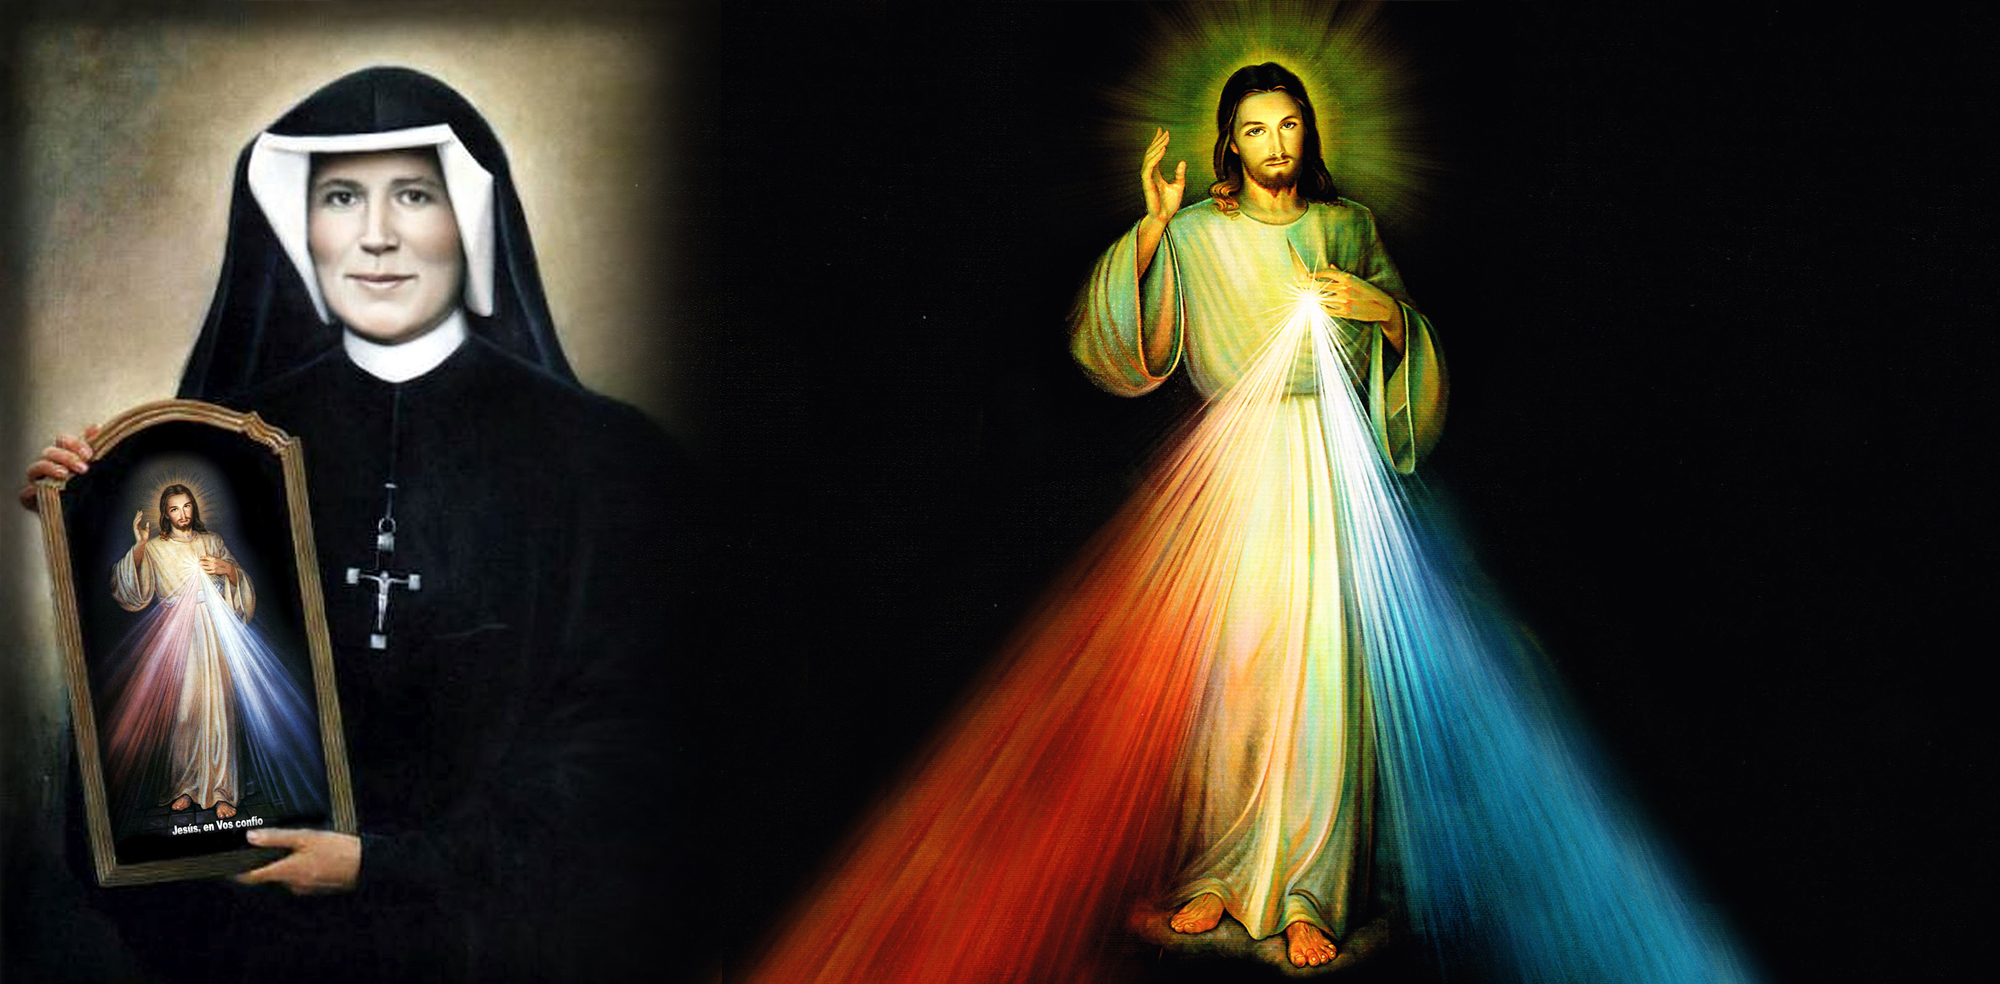 Sv. Faustina Kowalska